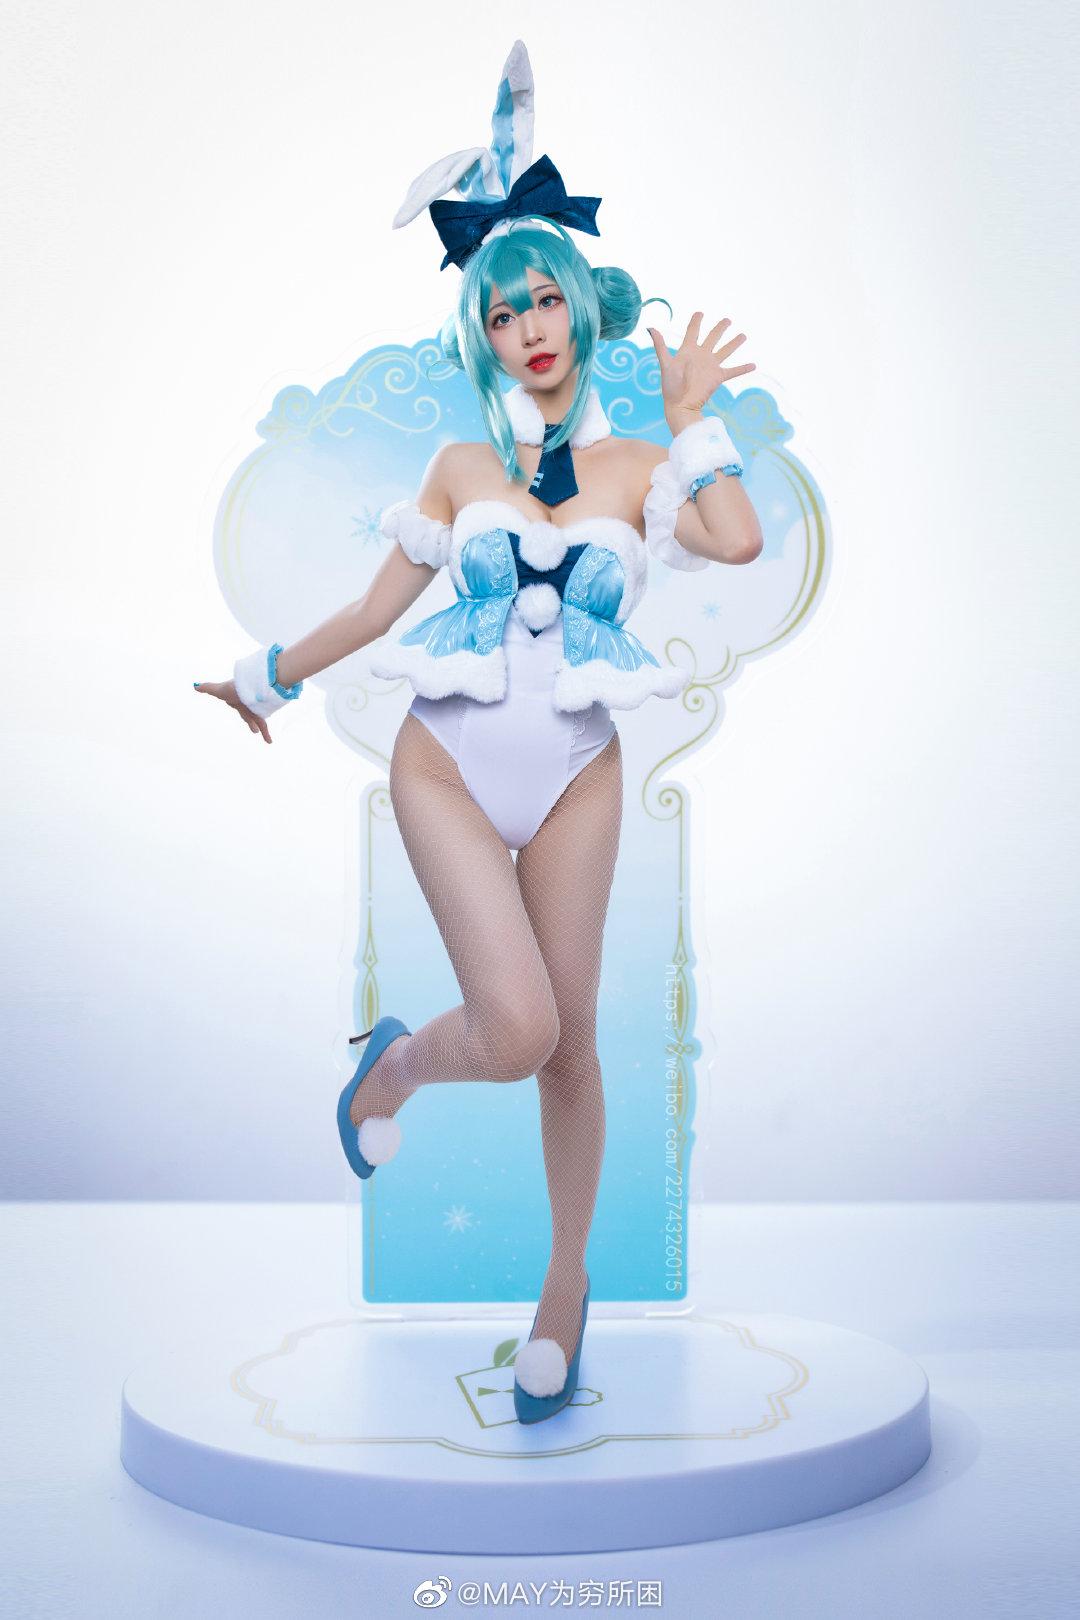 [COS]初音未来   兔女郎.Ver 白兔MIKU   @MAY为穷所困 (9P) -cosplay西装价格图片精选插图